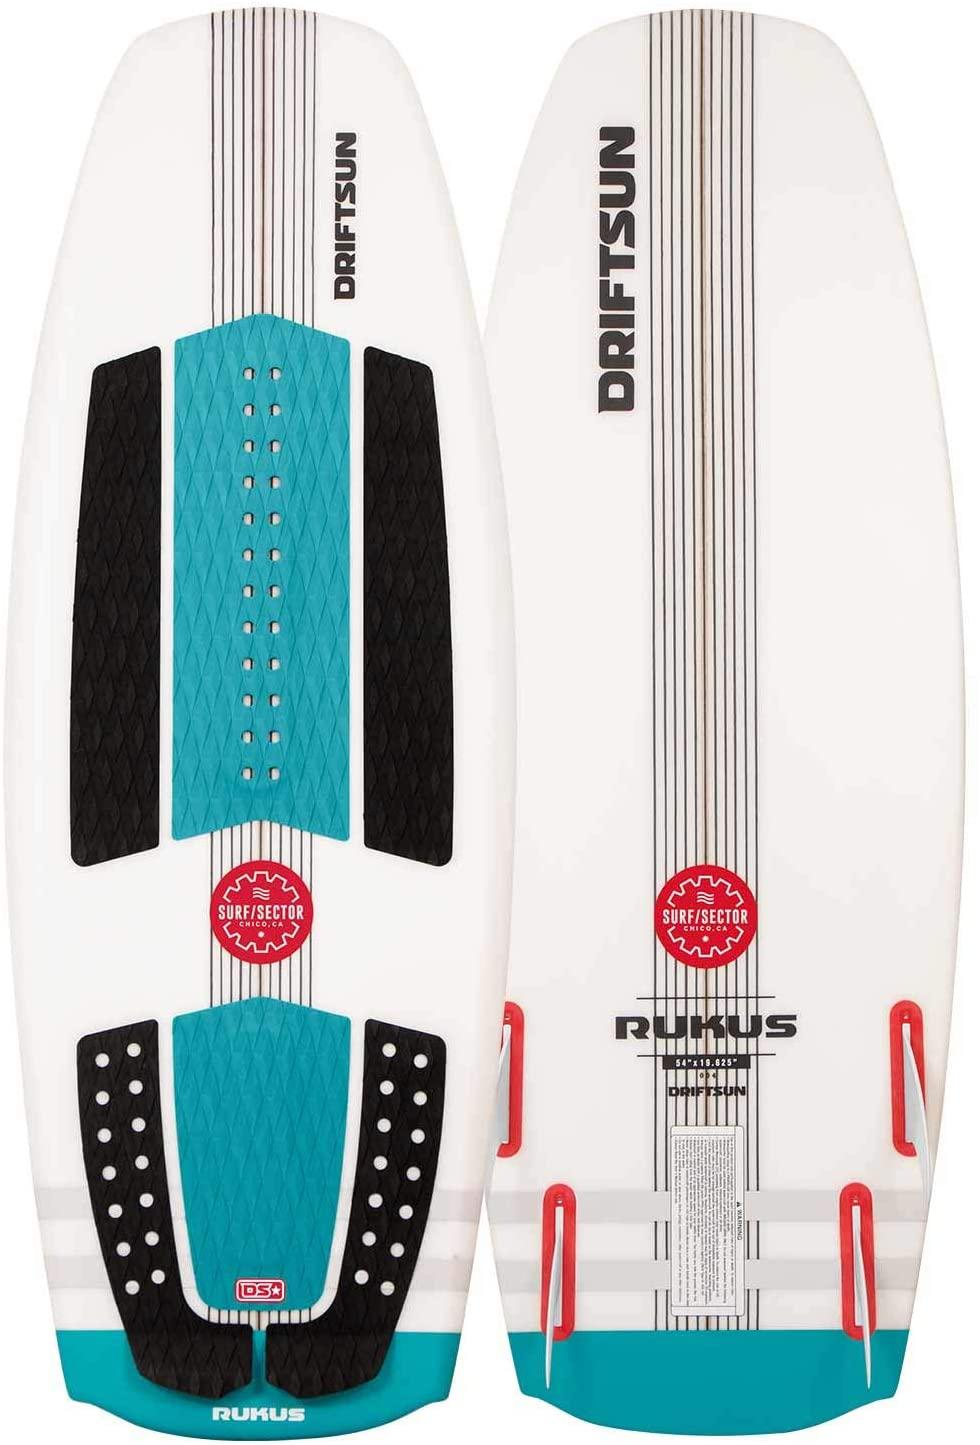 Driftsun Rukus Wakesurf Board - 4ft x 6in Surf Style Wakesurf Board for Intermediate to Advanced Riders, Fin Set Included